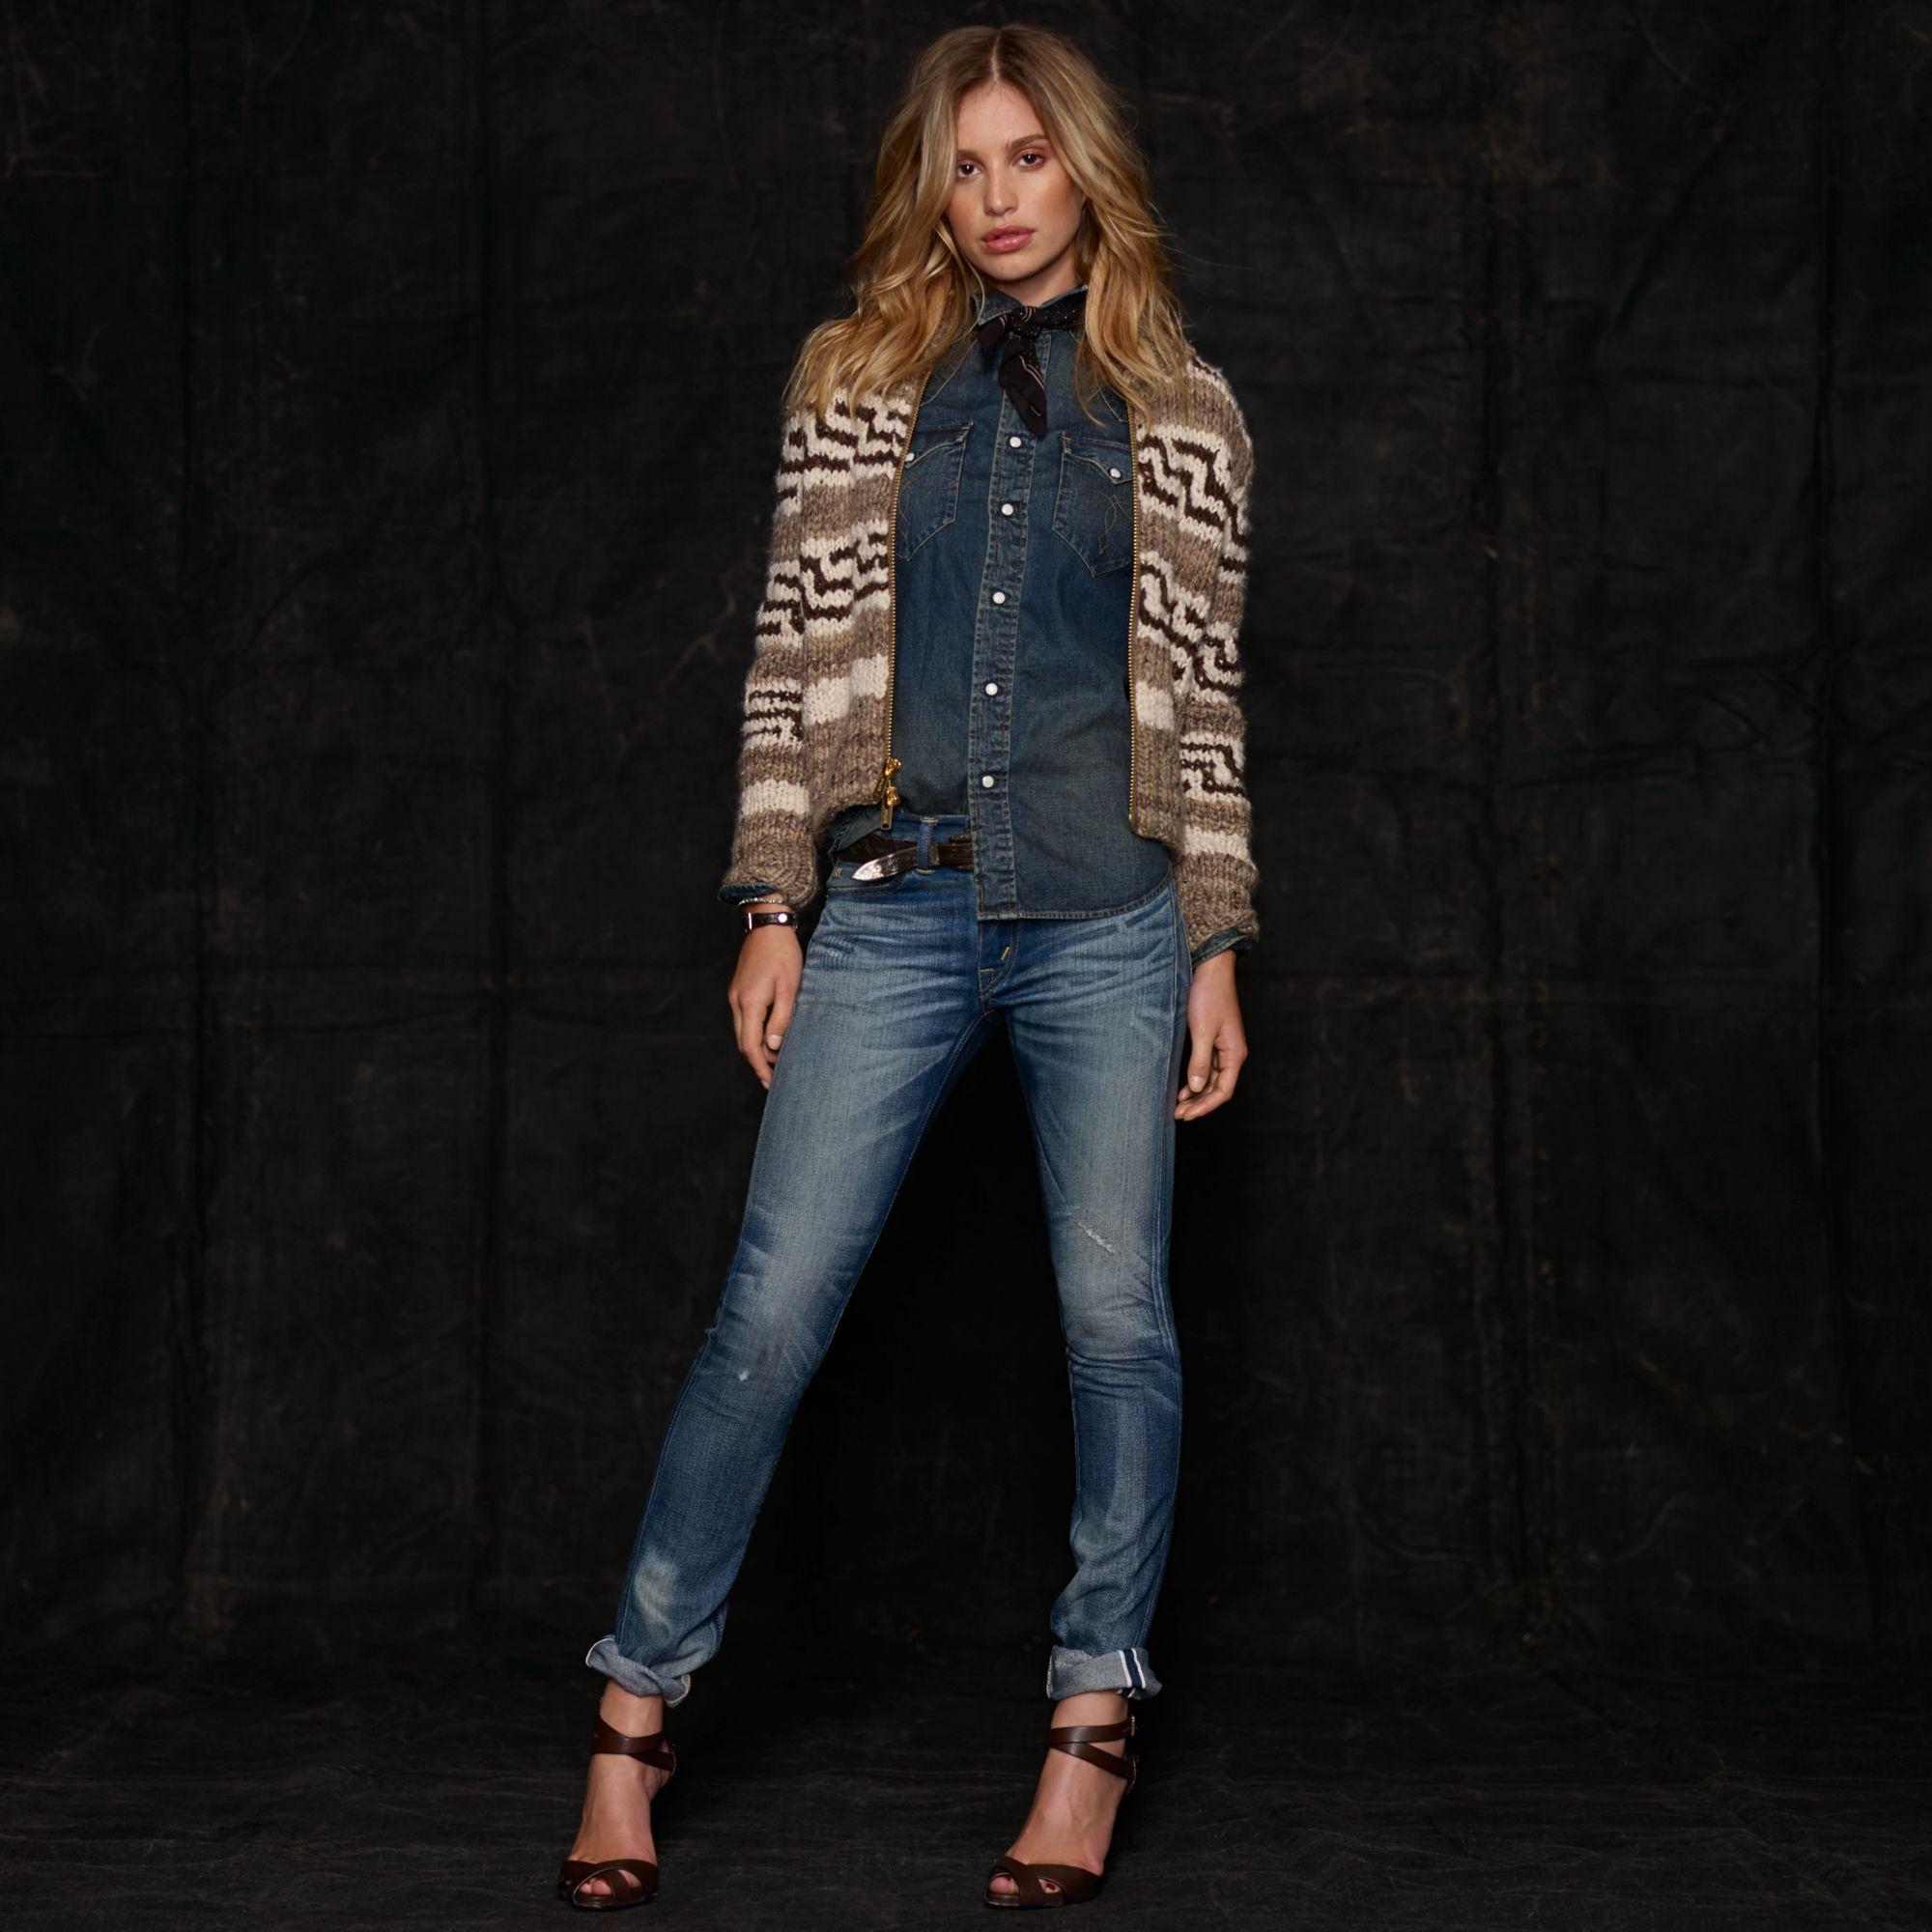 Women s RRL ) Shawl Collar Cardigan, Ralph Lauren Style, Sports Women,  Western 40e30a48df22